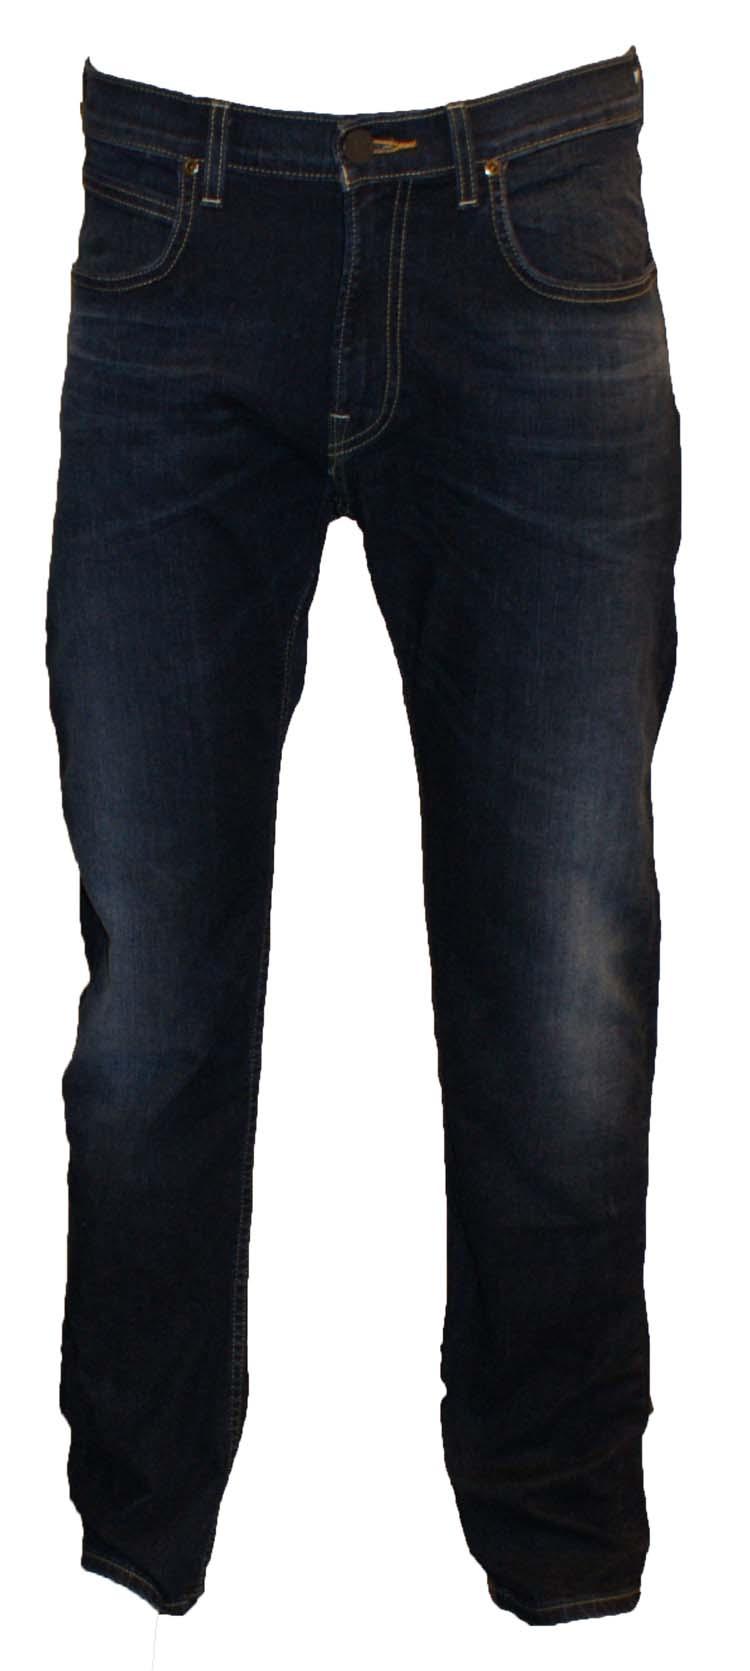 "Lee stretch jeans "" Blake "" Ultra dark used"